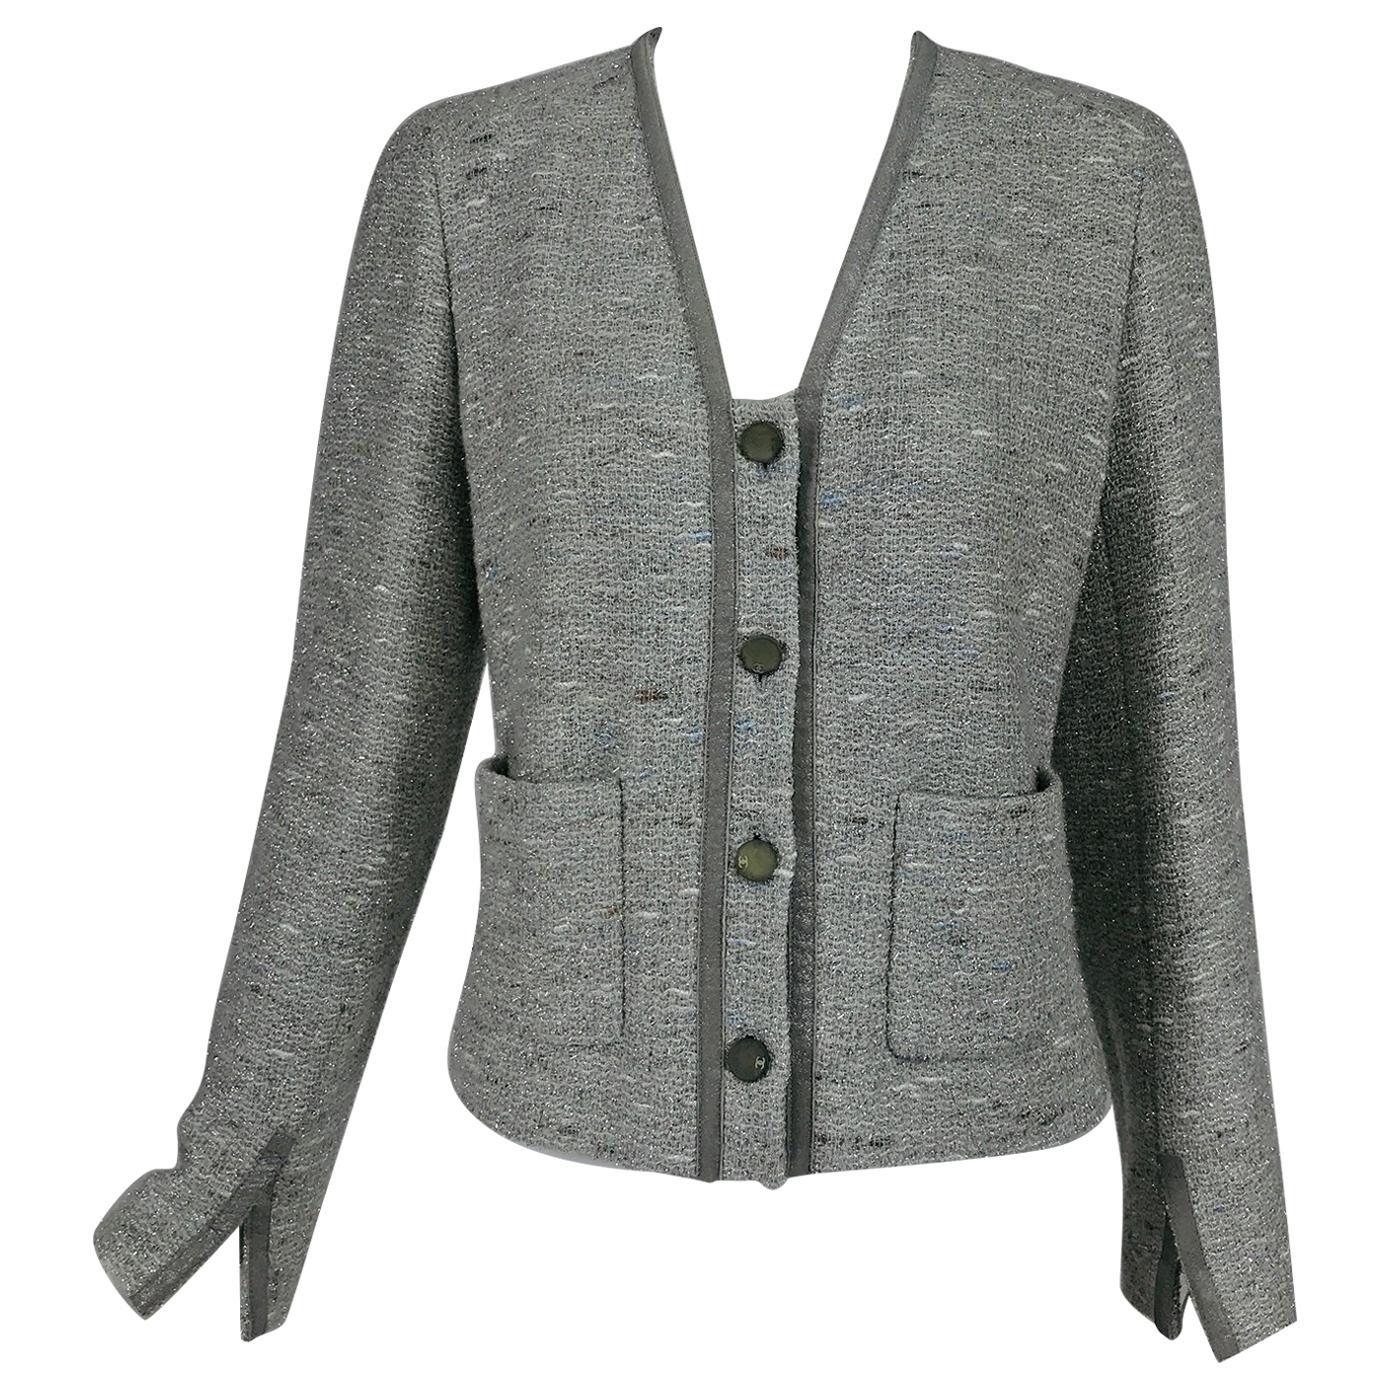 Chanel Silver Grey Metallic Slub Tweed Jacket 1999A 42